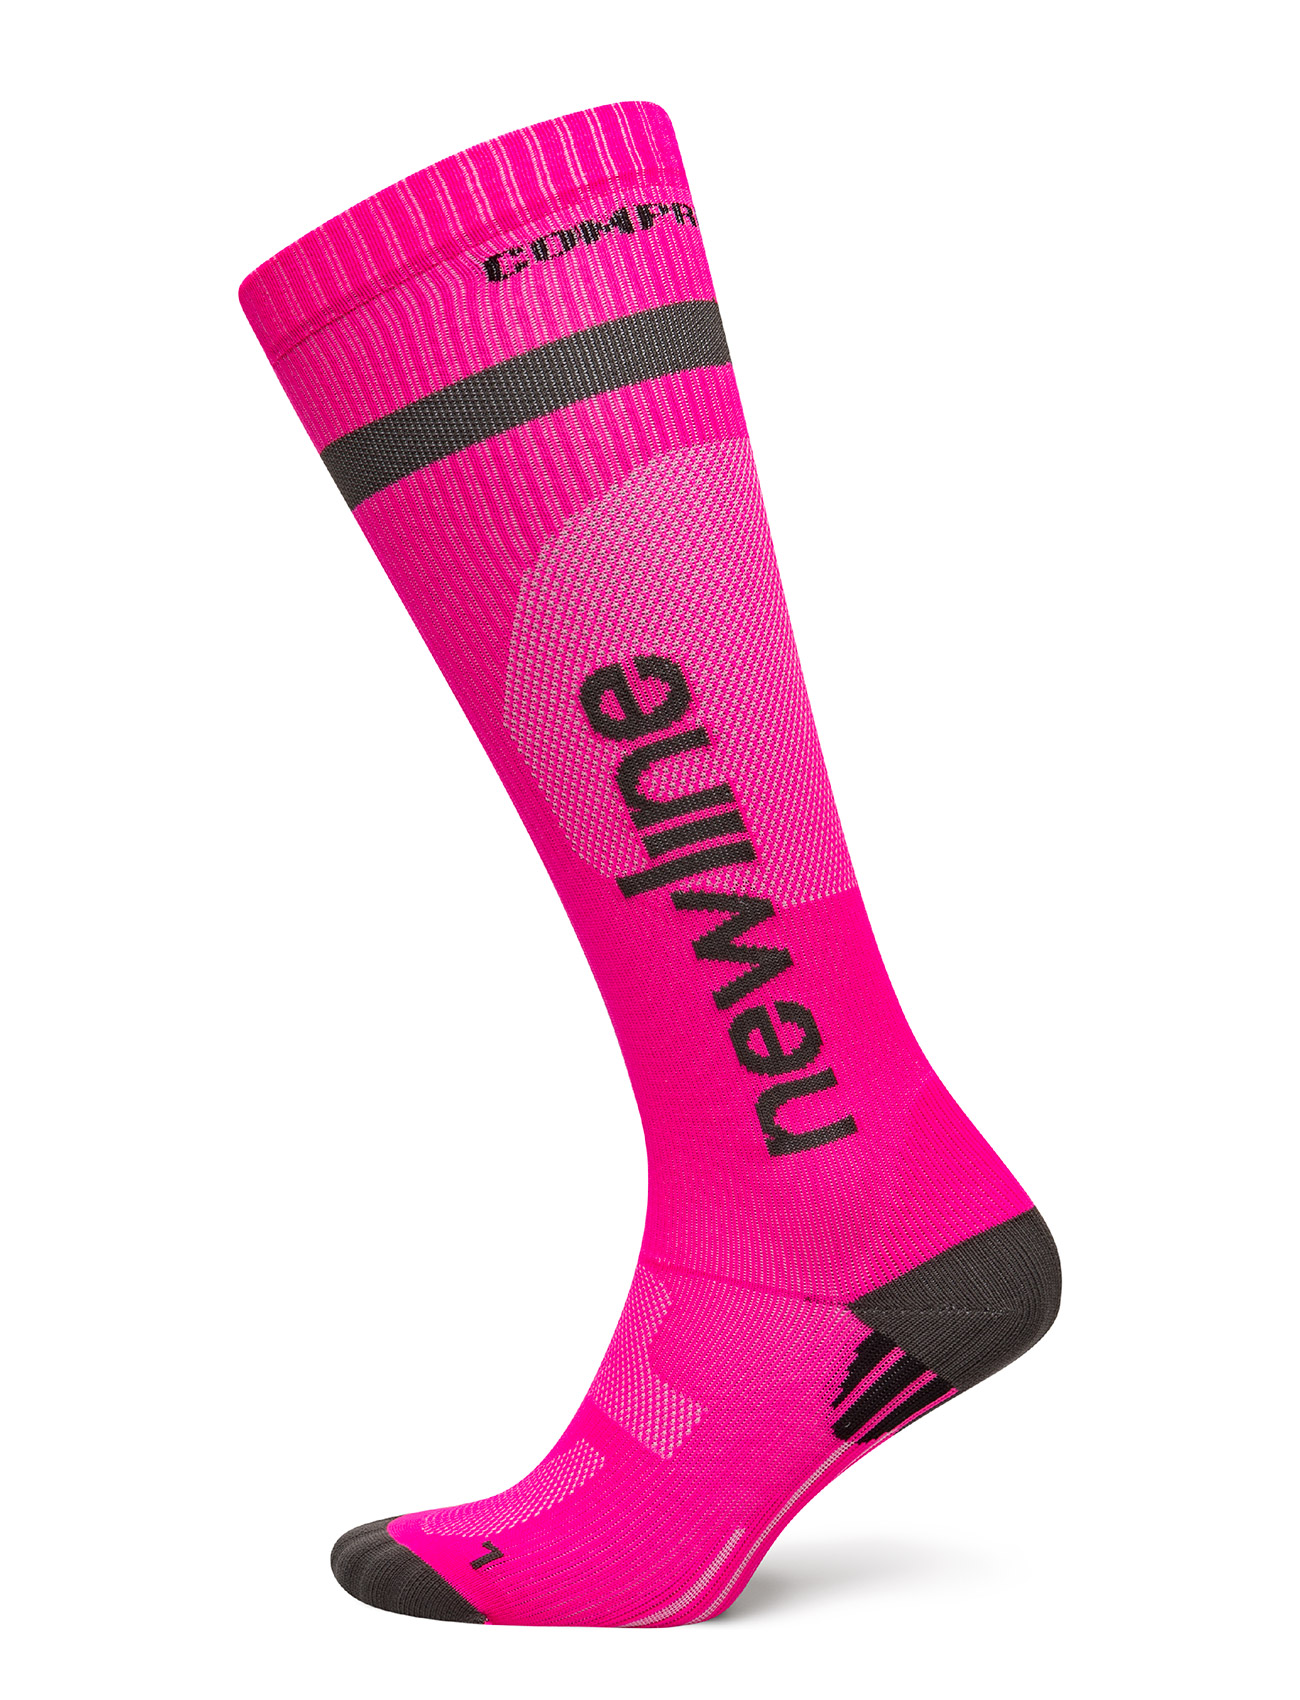 Newline Compression Sock